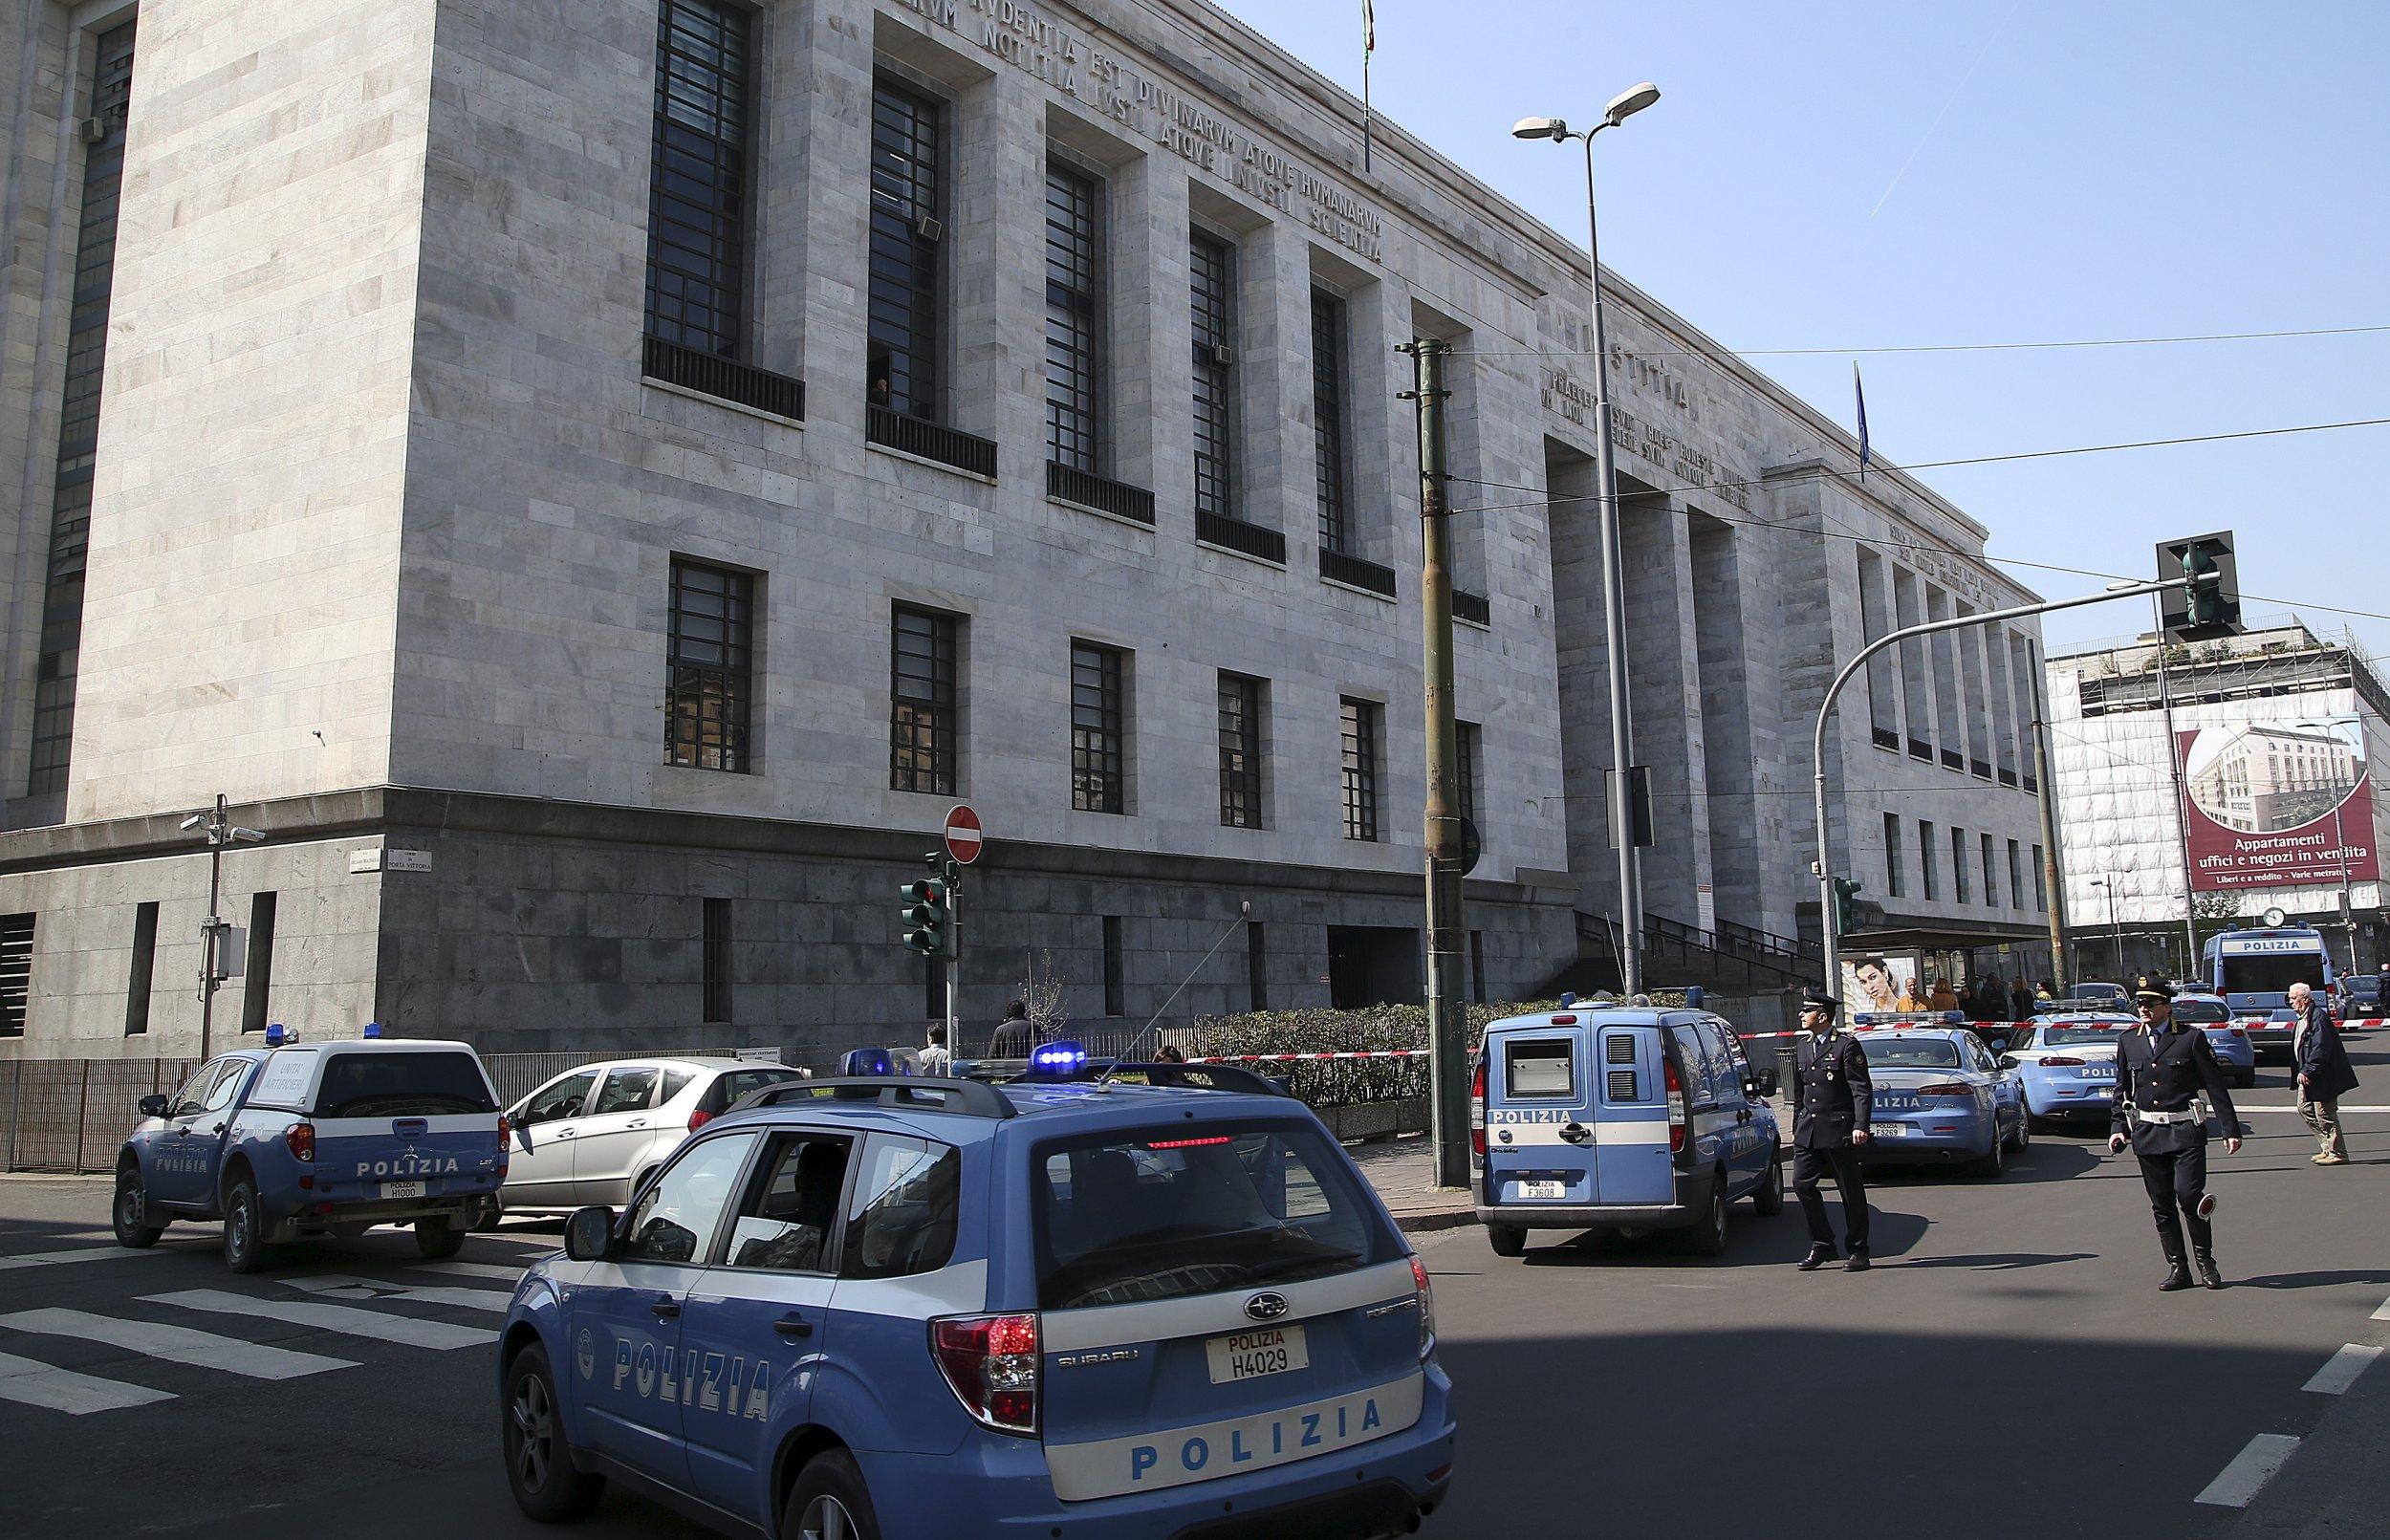 Police cars surround the tribunal of Milan April 9, 2015.